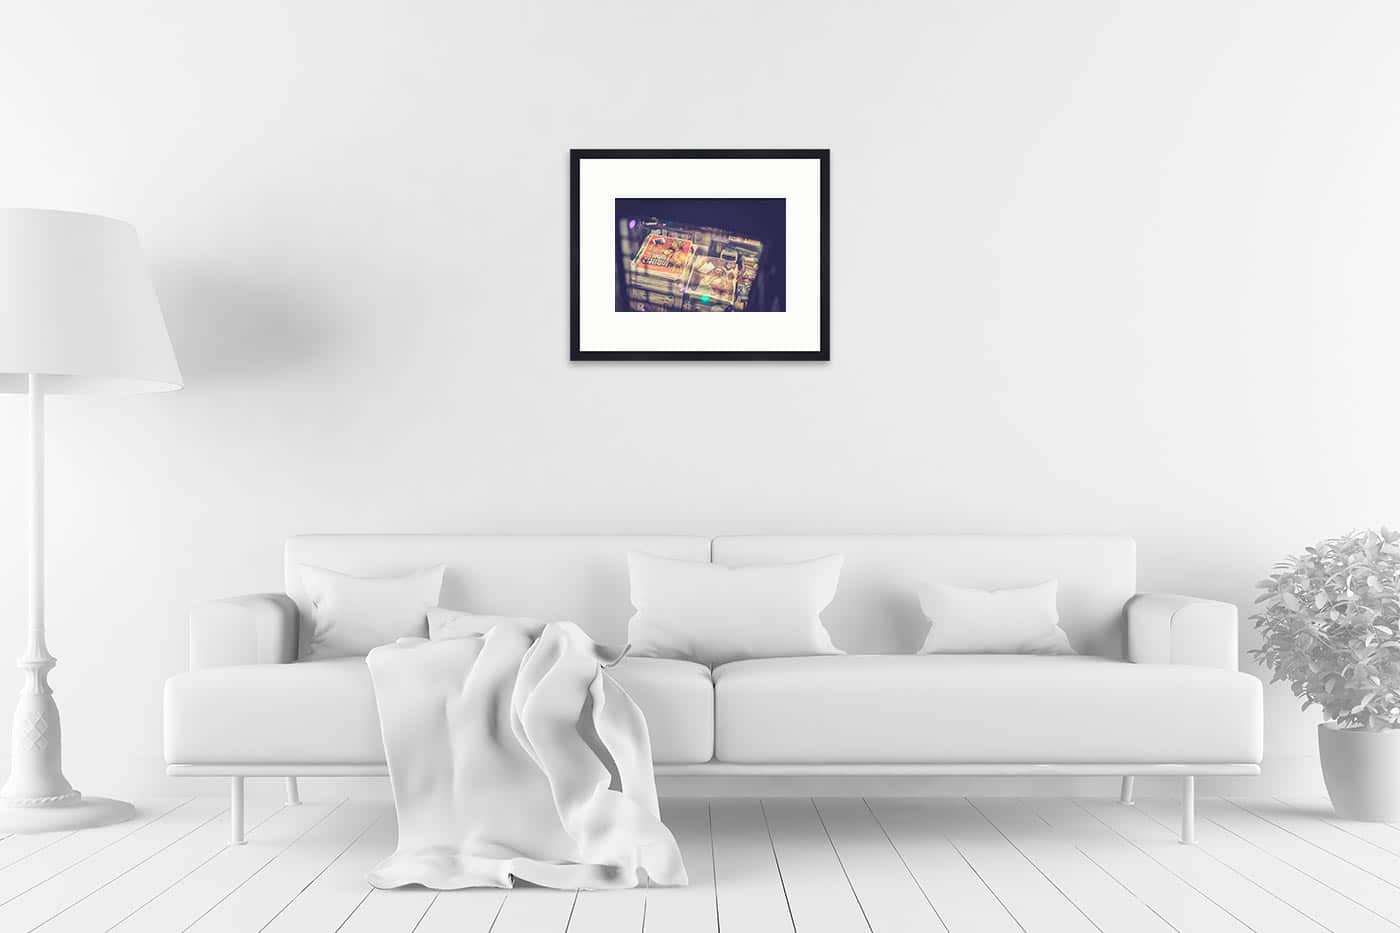 Cadre galerie 40x50 Bollywood